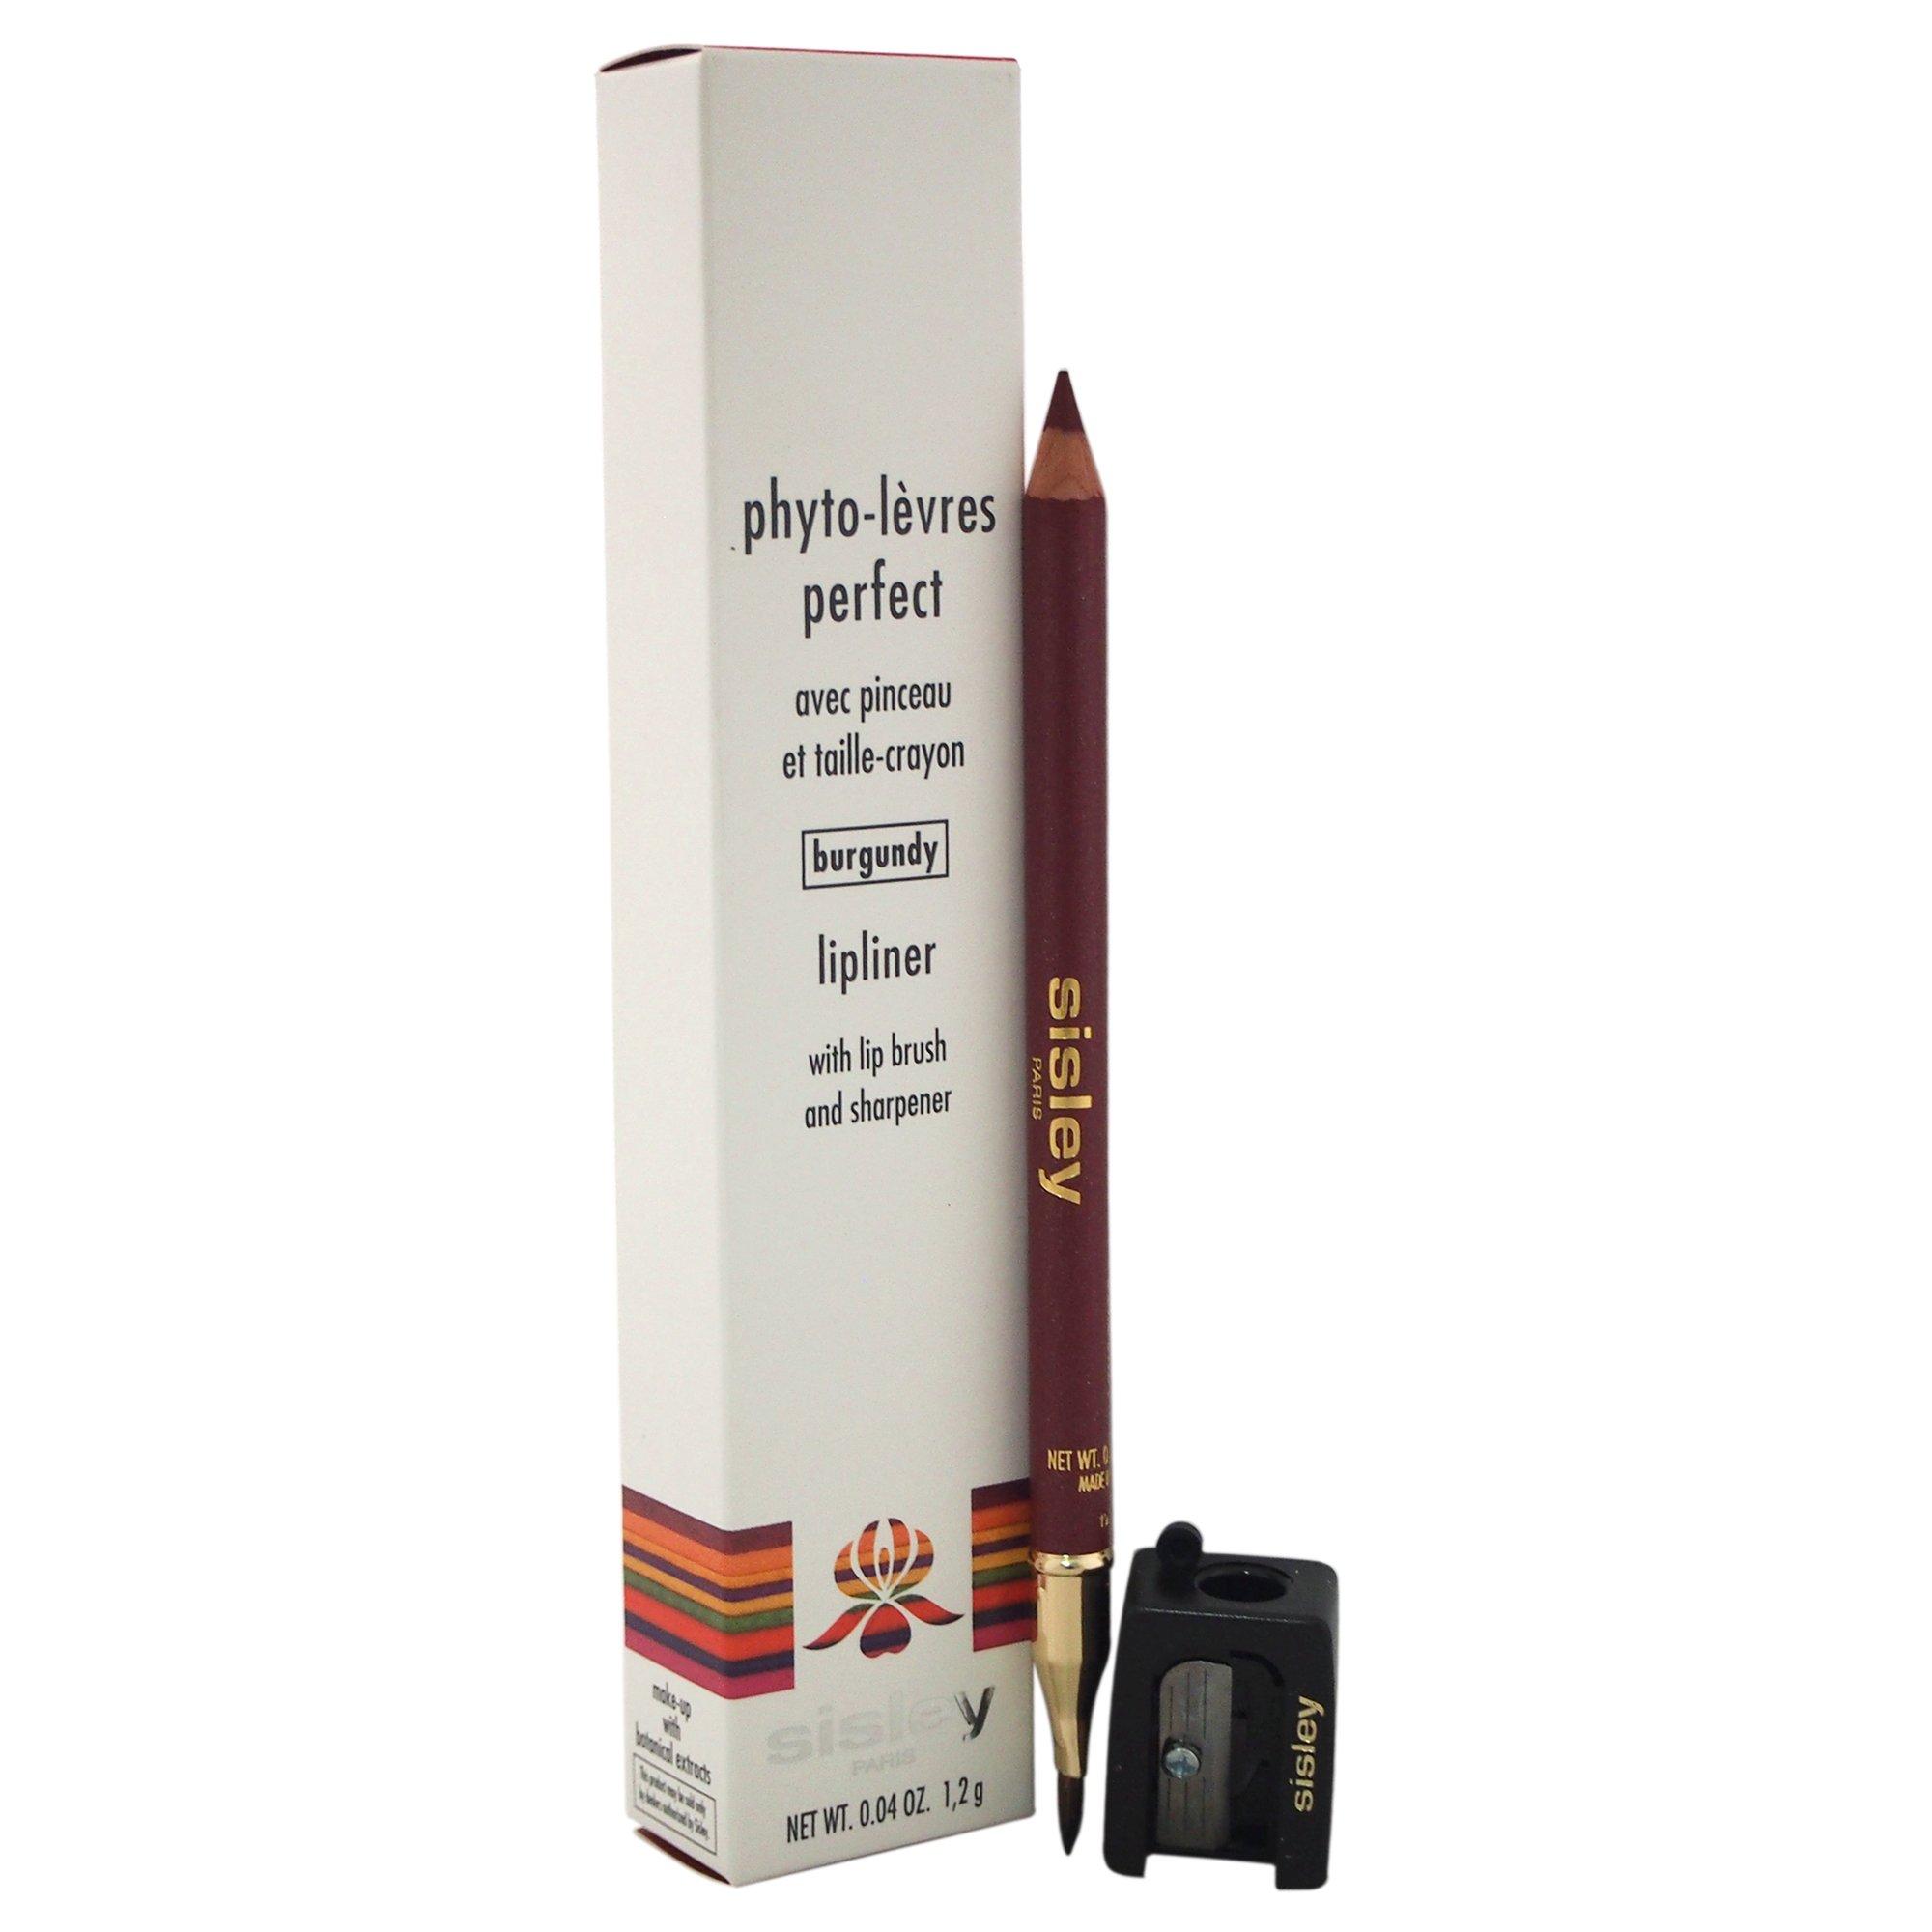 Phyto Levres Perfect Lip Liner With Lip Brush & Sharpener - Burgundy by Sisley for Women - 1.45 g Lipliner by Sisley